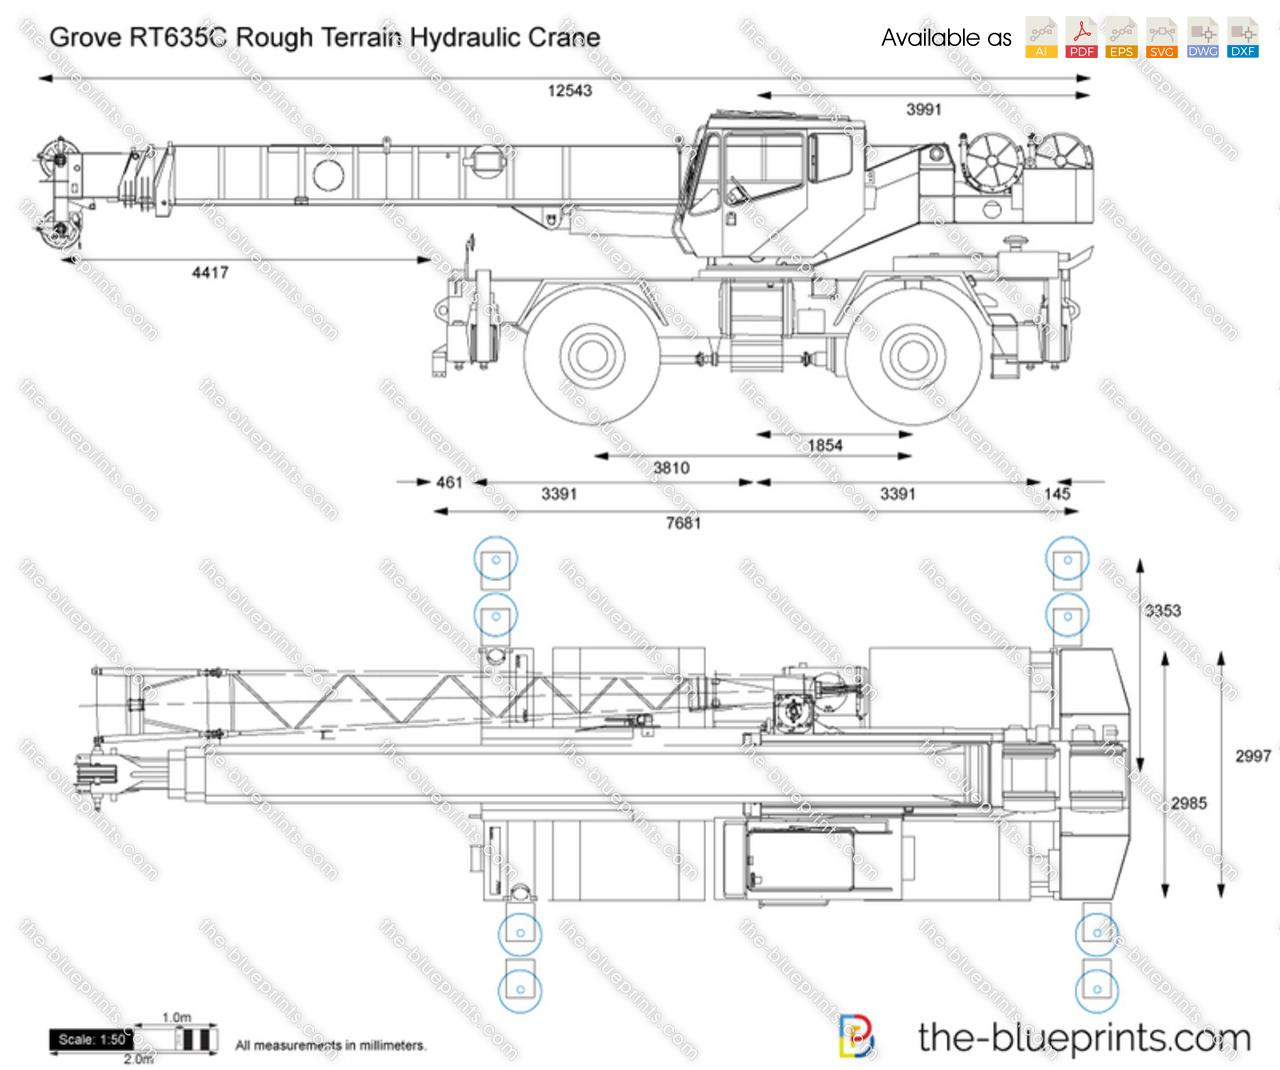 Grove RT635C Rough Terrain Hydraulic Crane